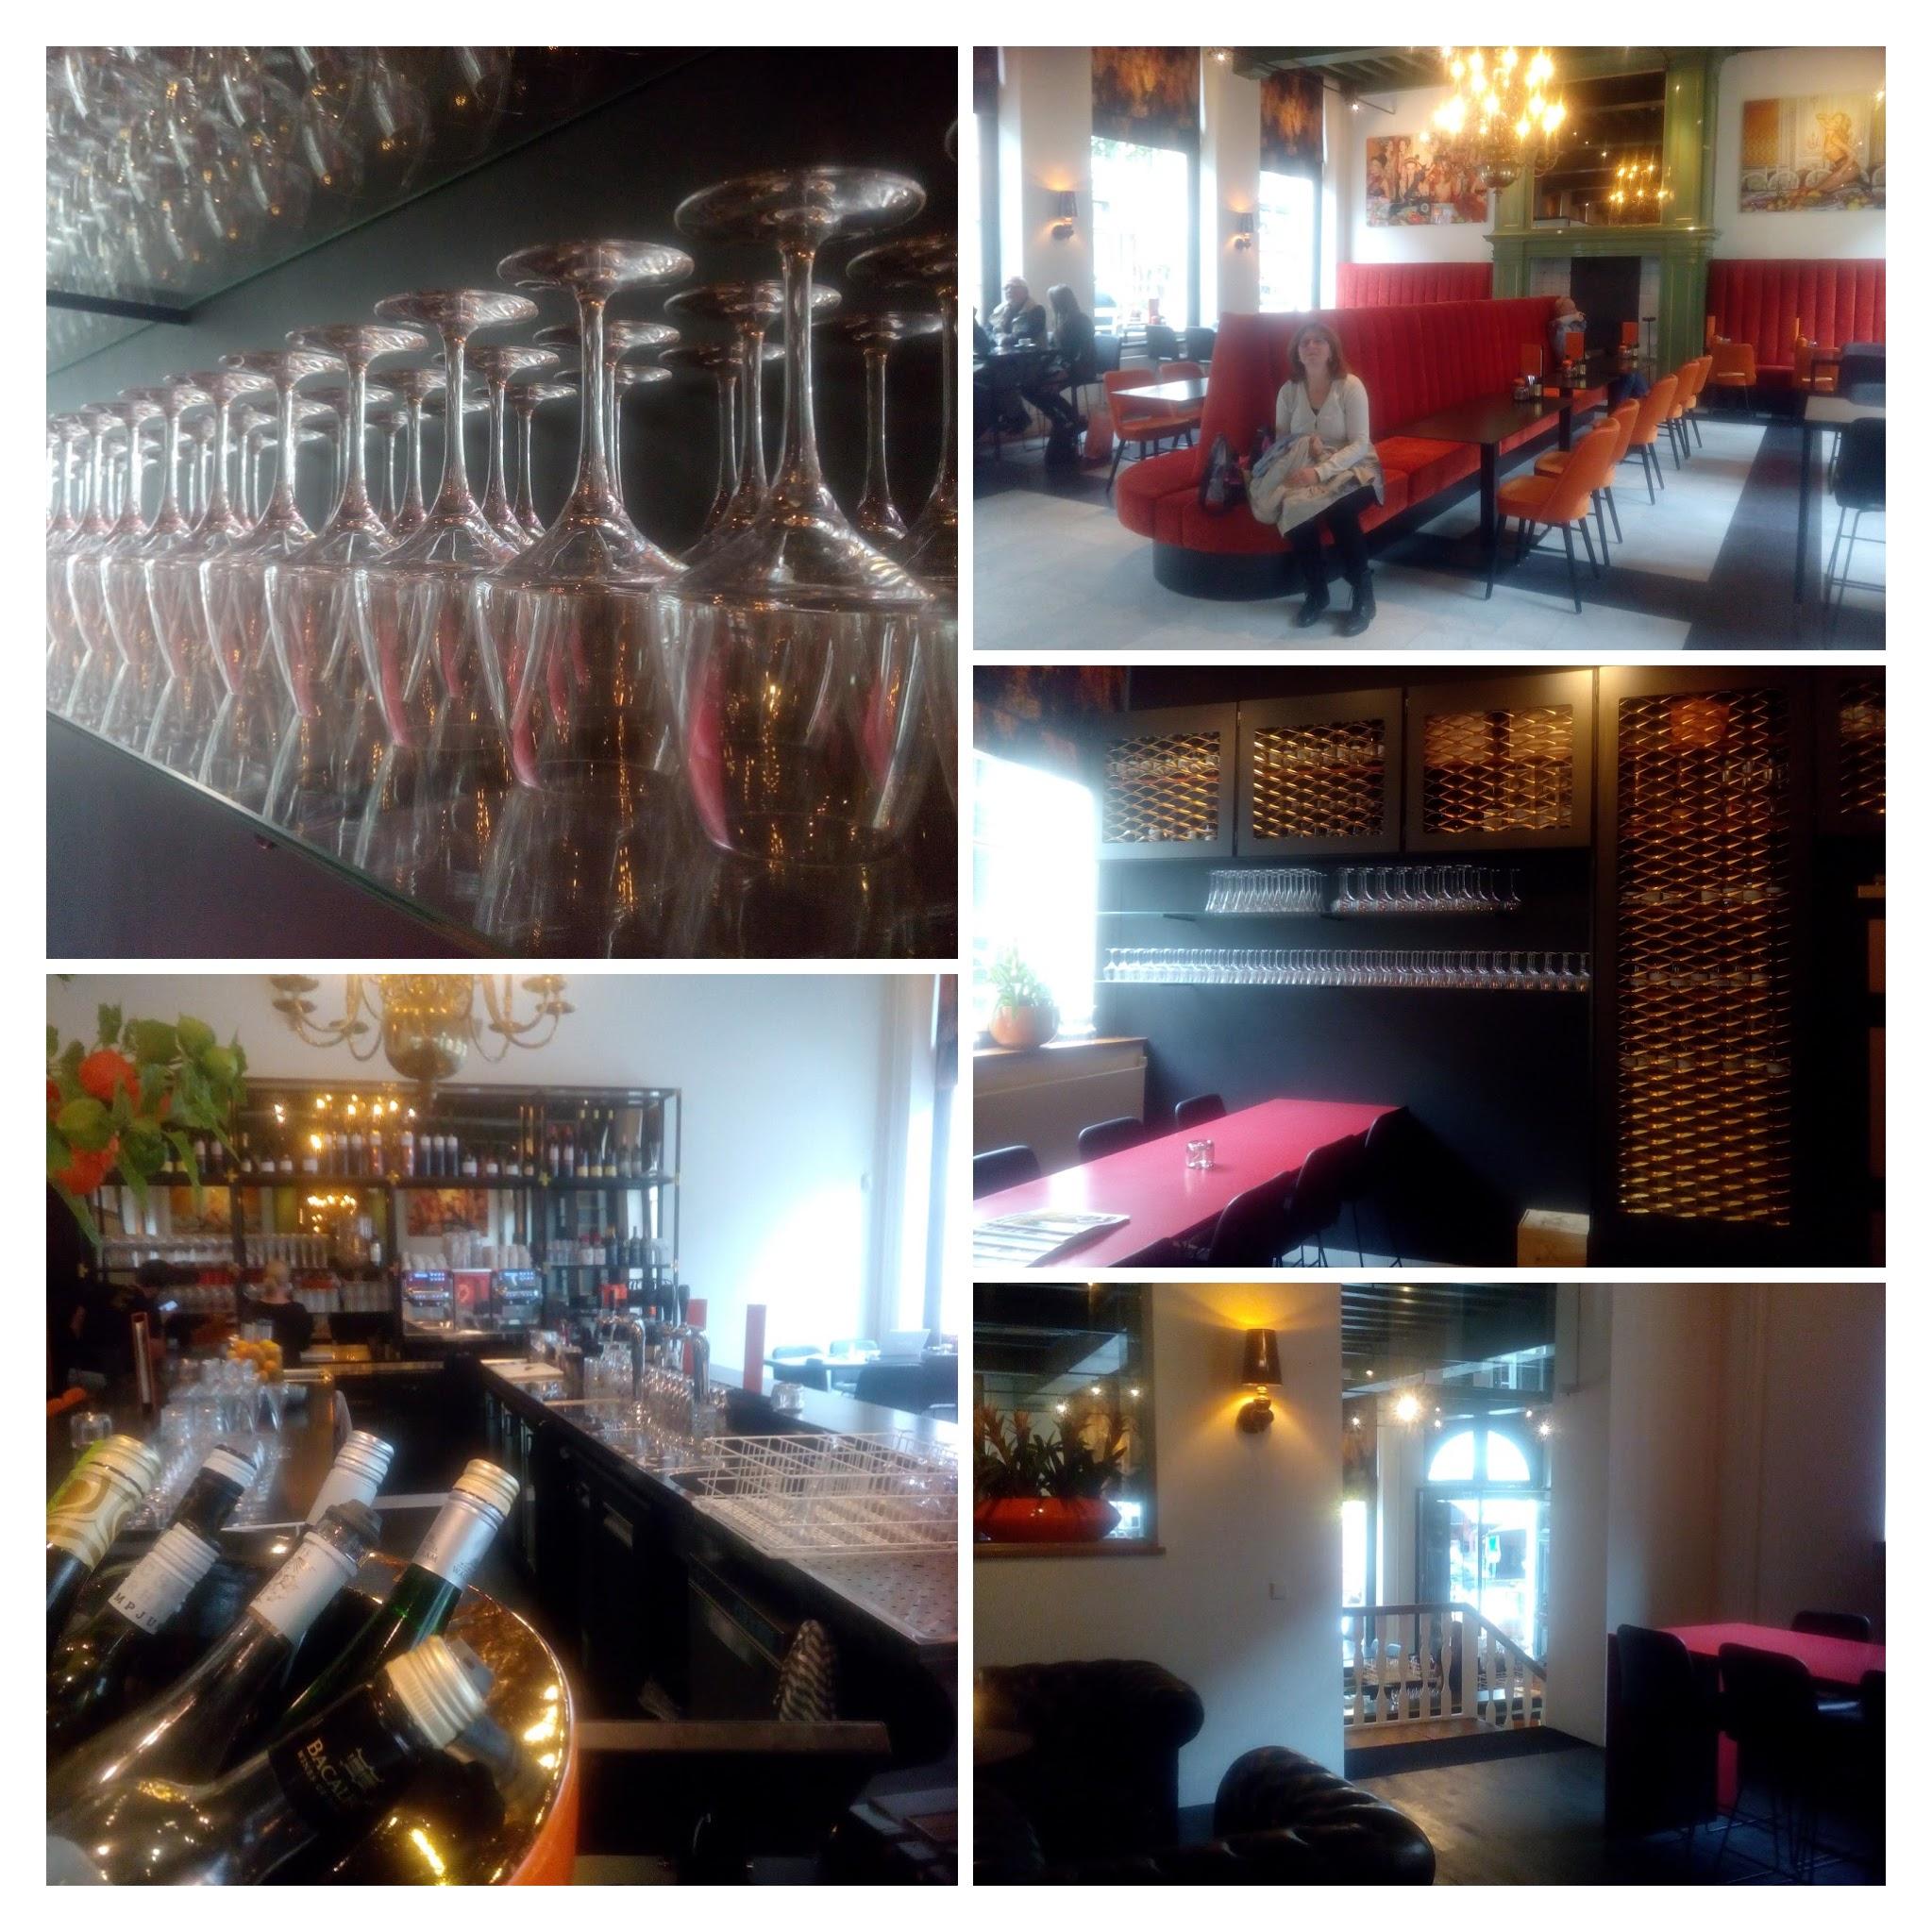 stuyvesant-wijnlokaal-in-amsterdam-centrum